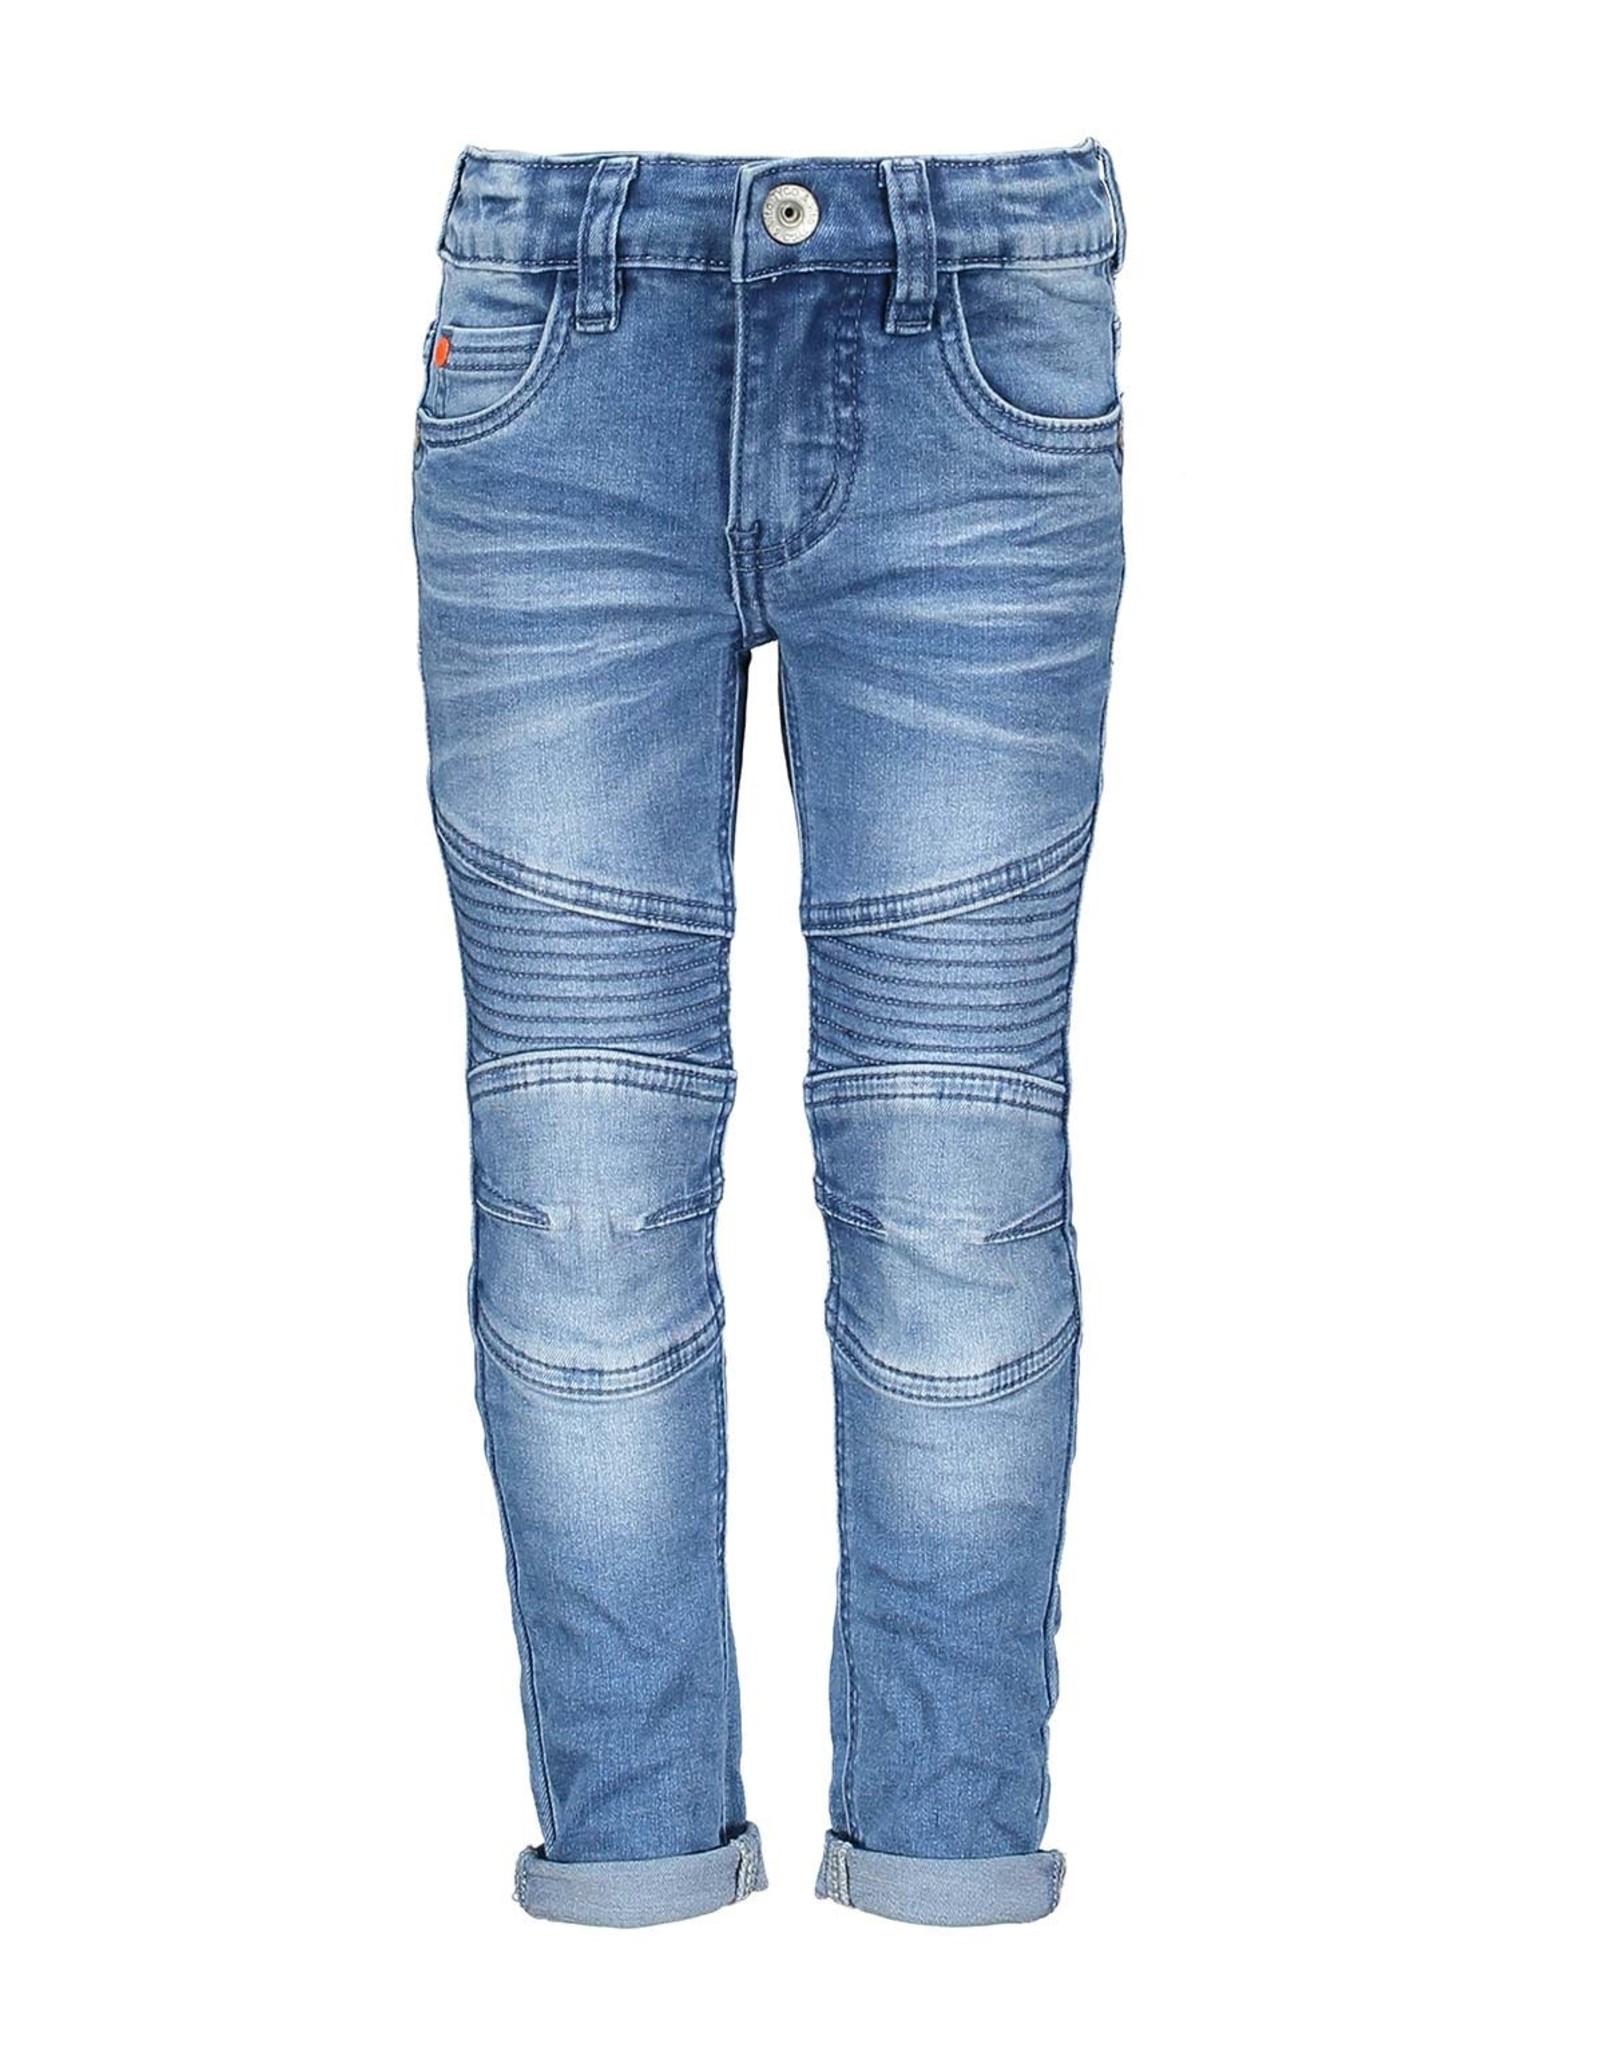 Tygo & vito Jeans stretch denim fancy kneeparts 802 m.used